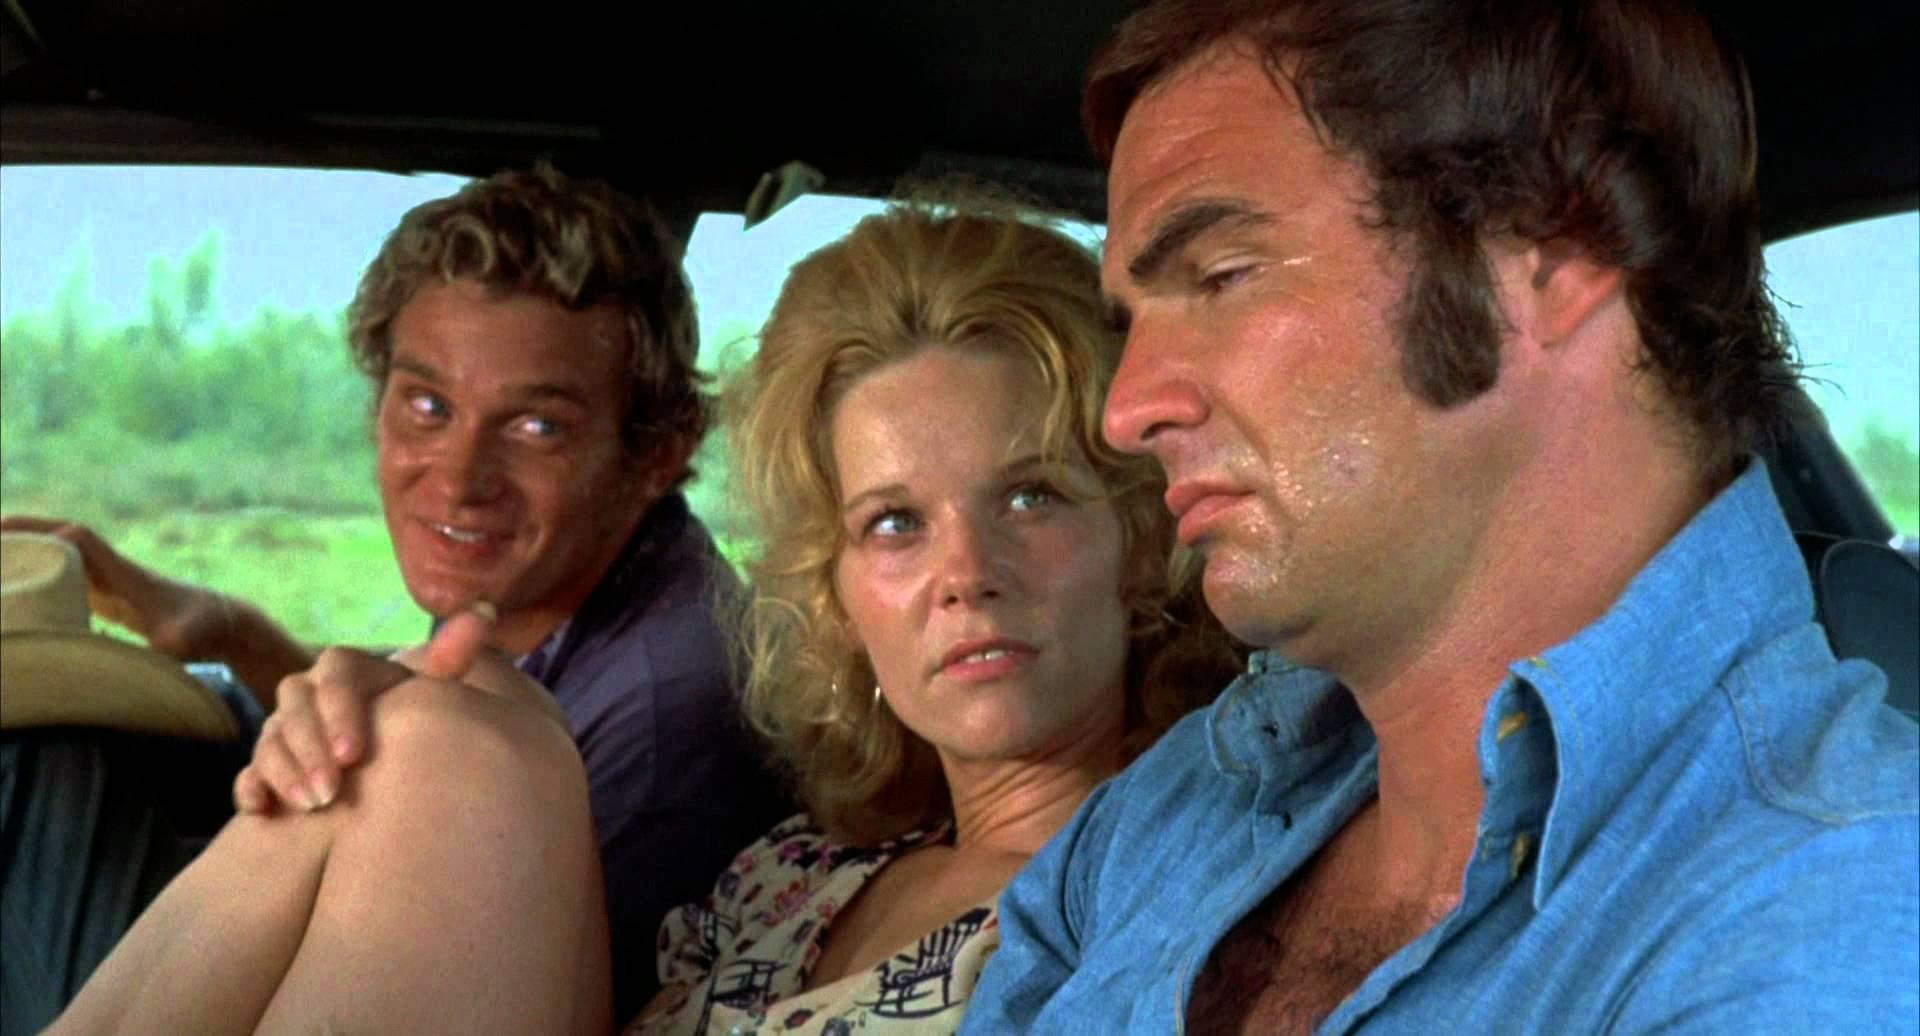 Bo Hopkins, Jennifer Billingsley, and our man Burt. They work! They carpool! They sweat!